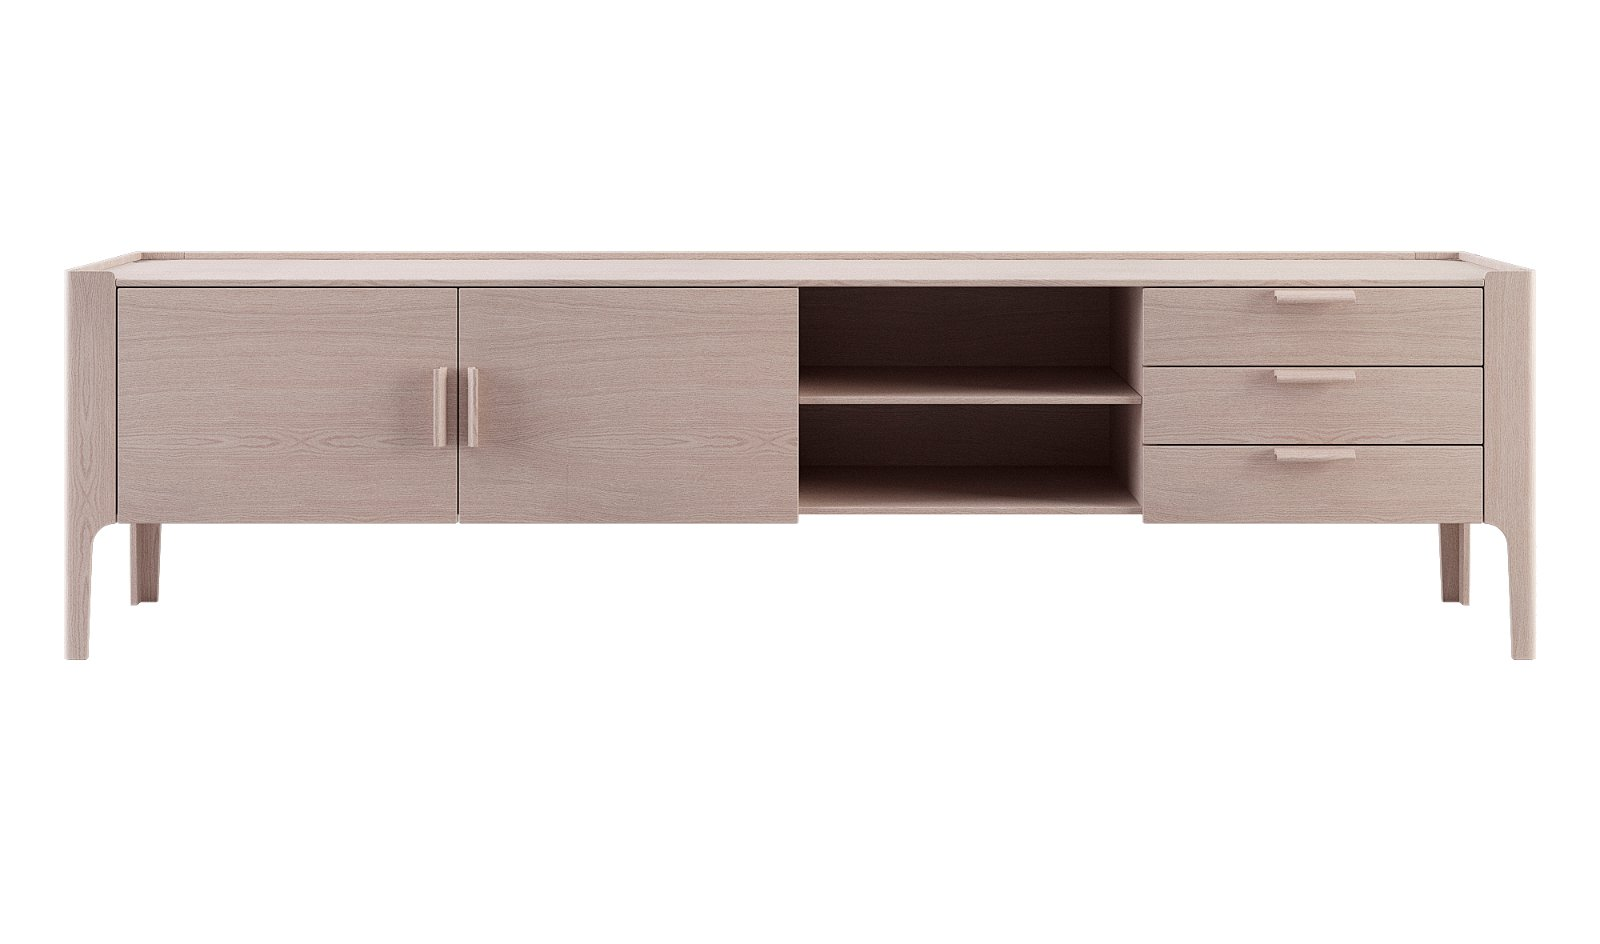 Mueble tv 2 puertas Arquitect Calgary by Bodonni